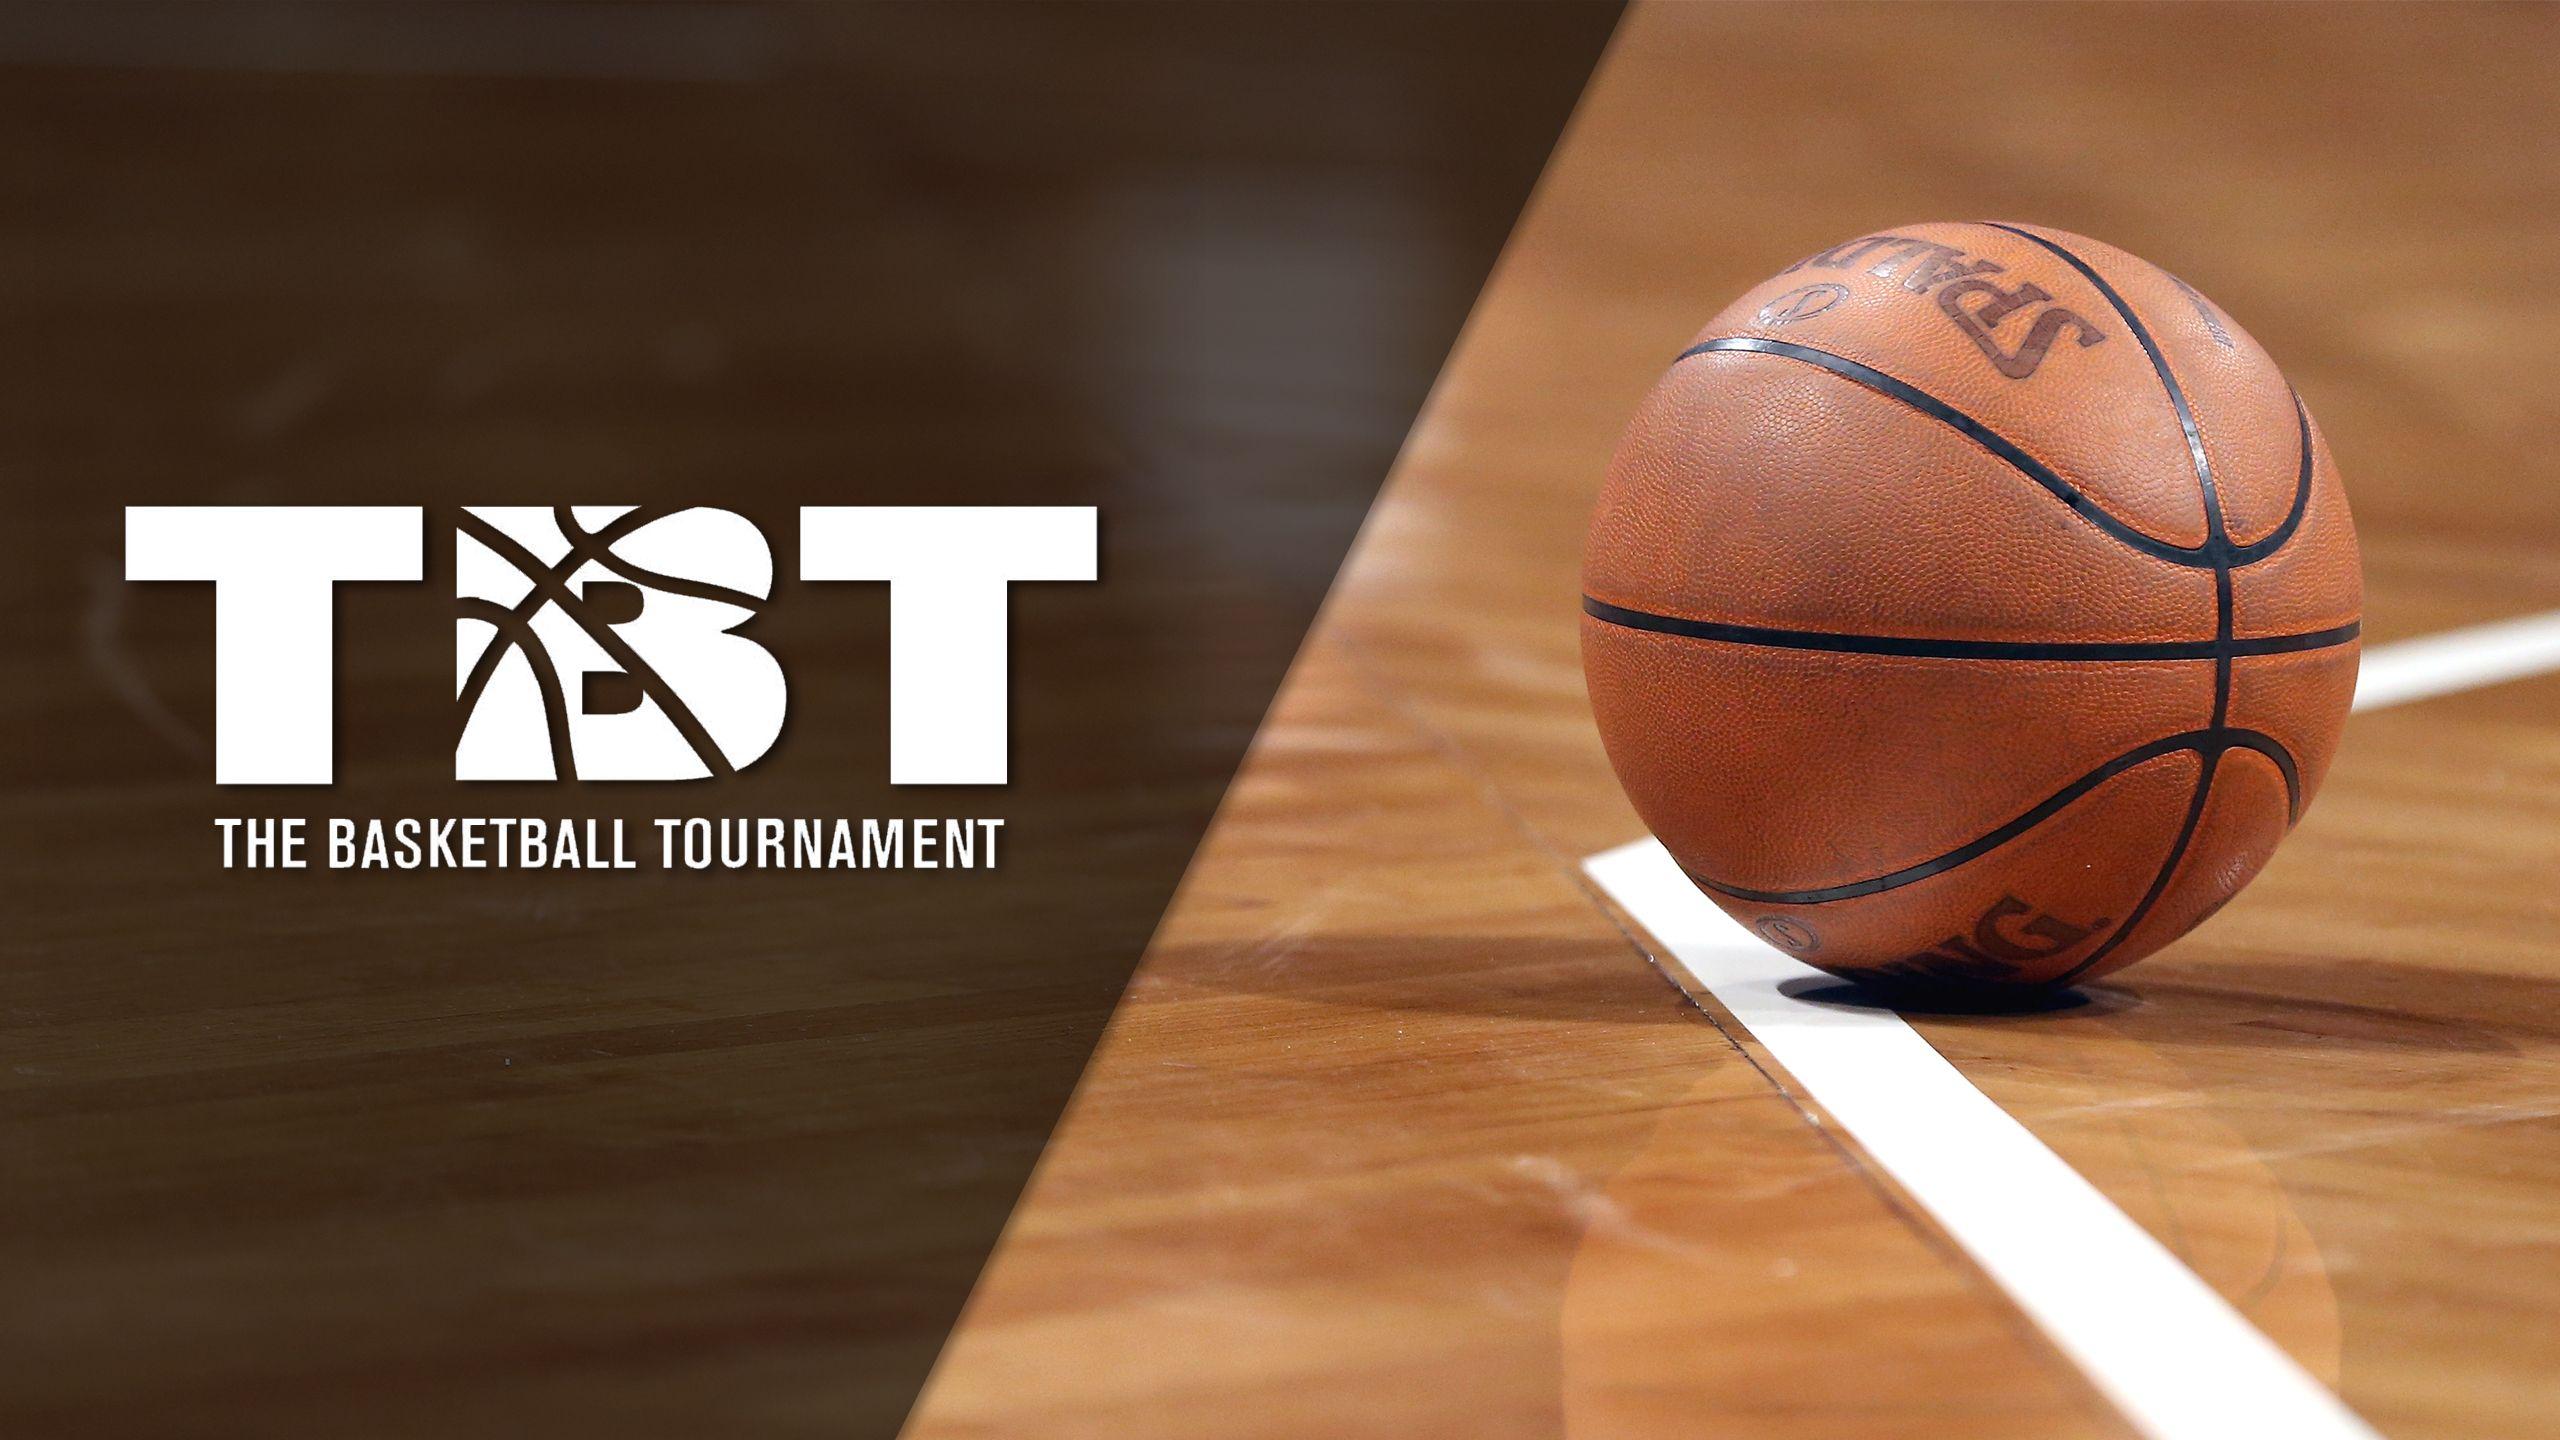 CitiTeam Blazers (Drew League) vs. Team 23 (Regional Round) (TBT)